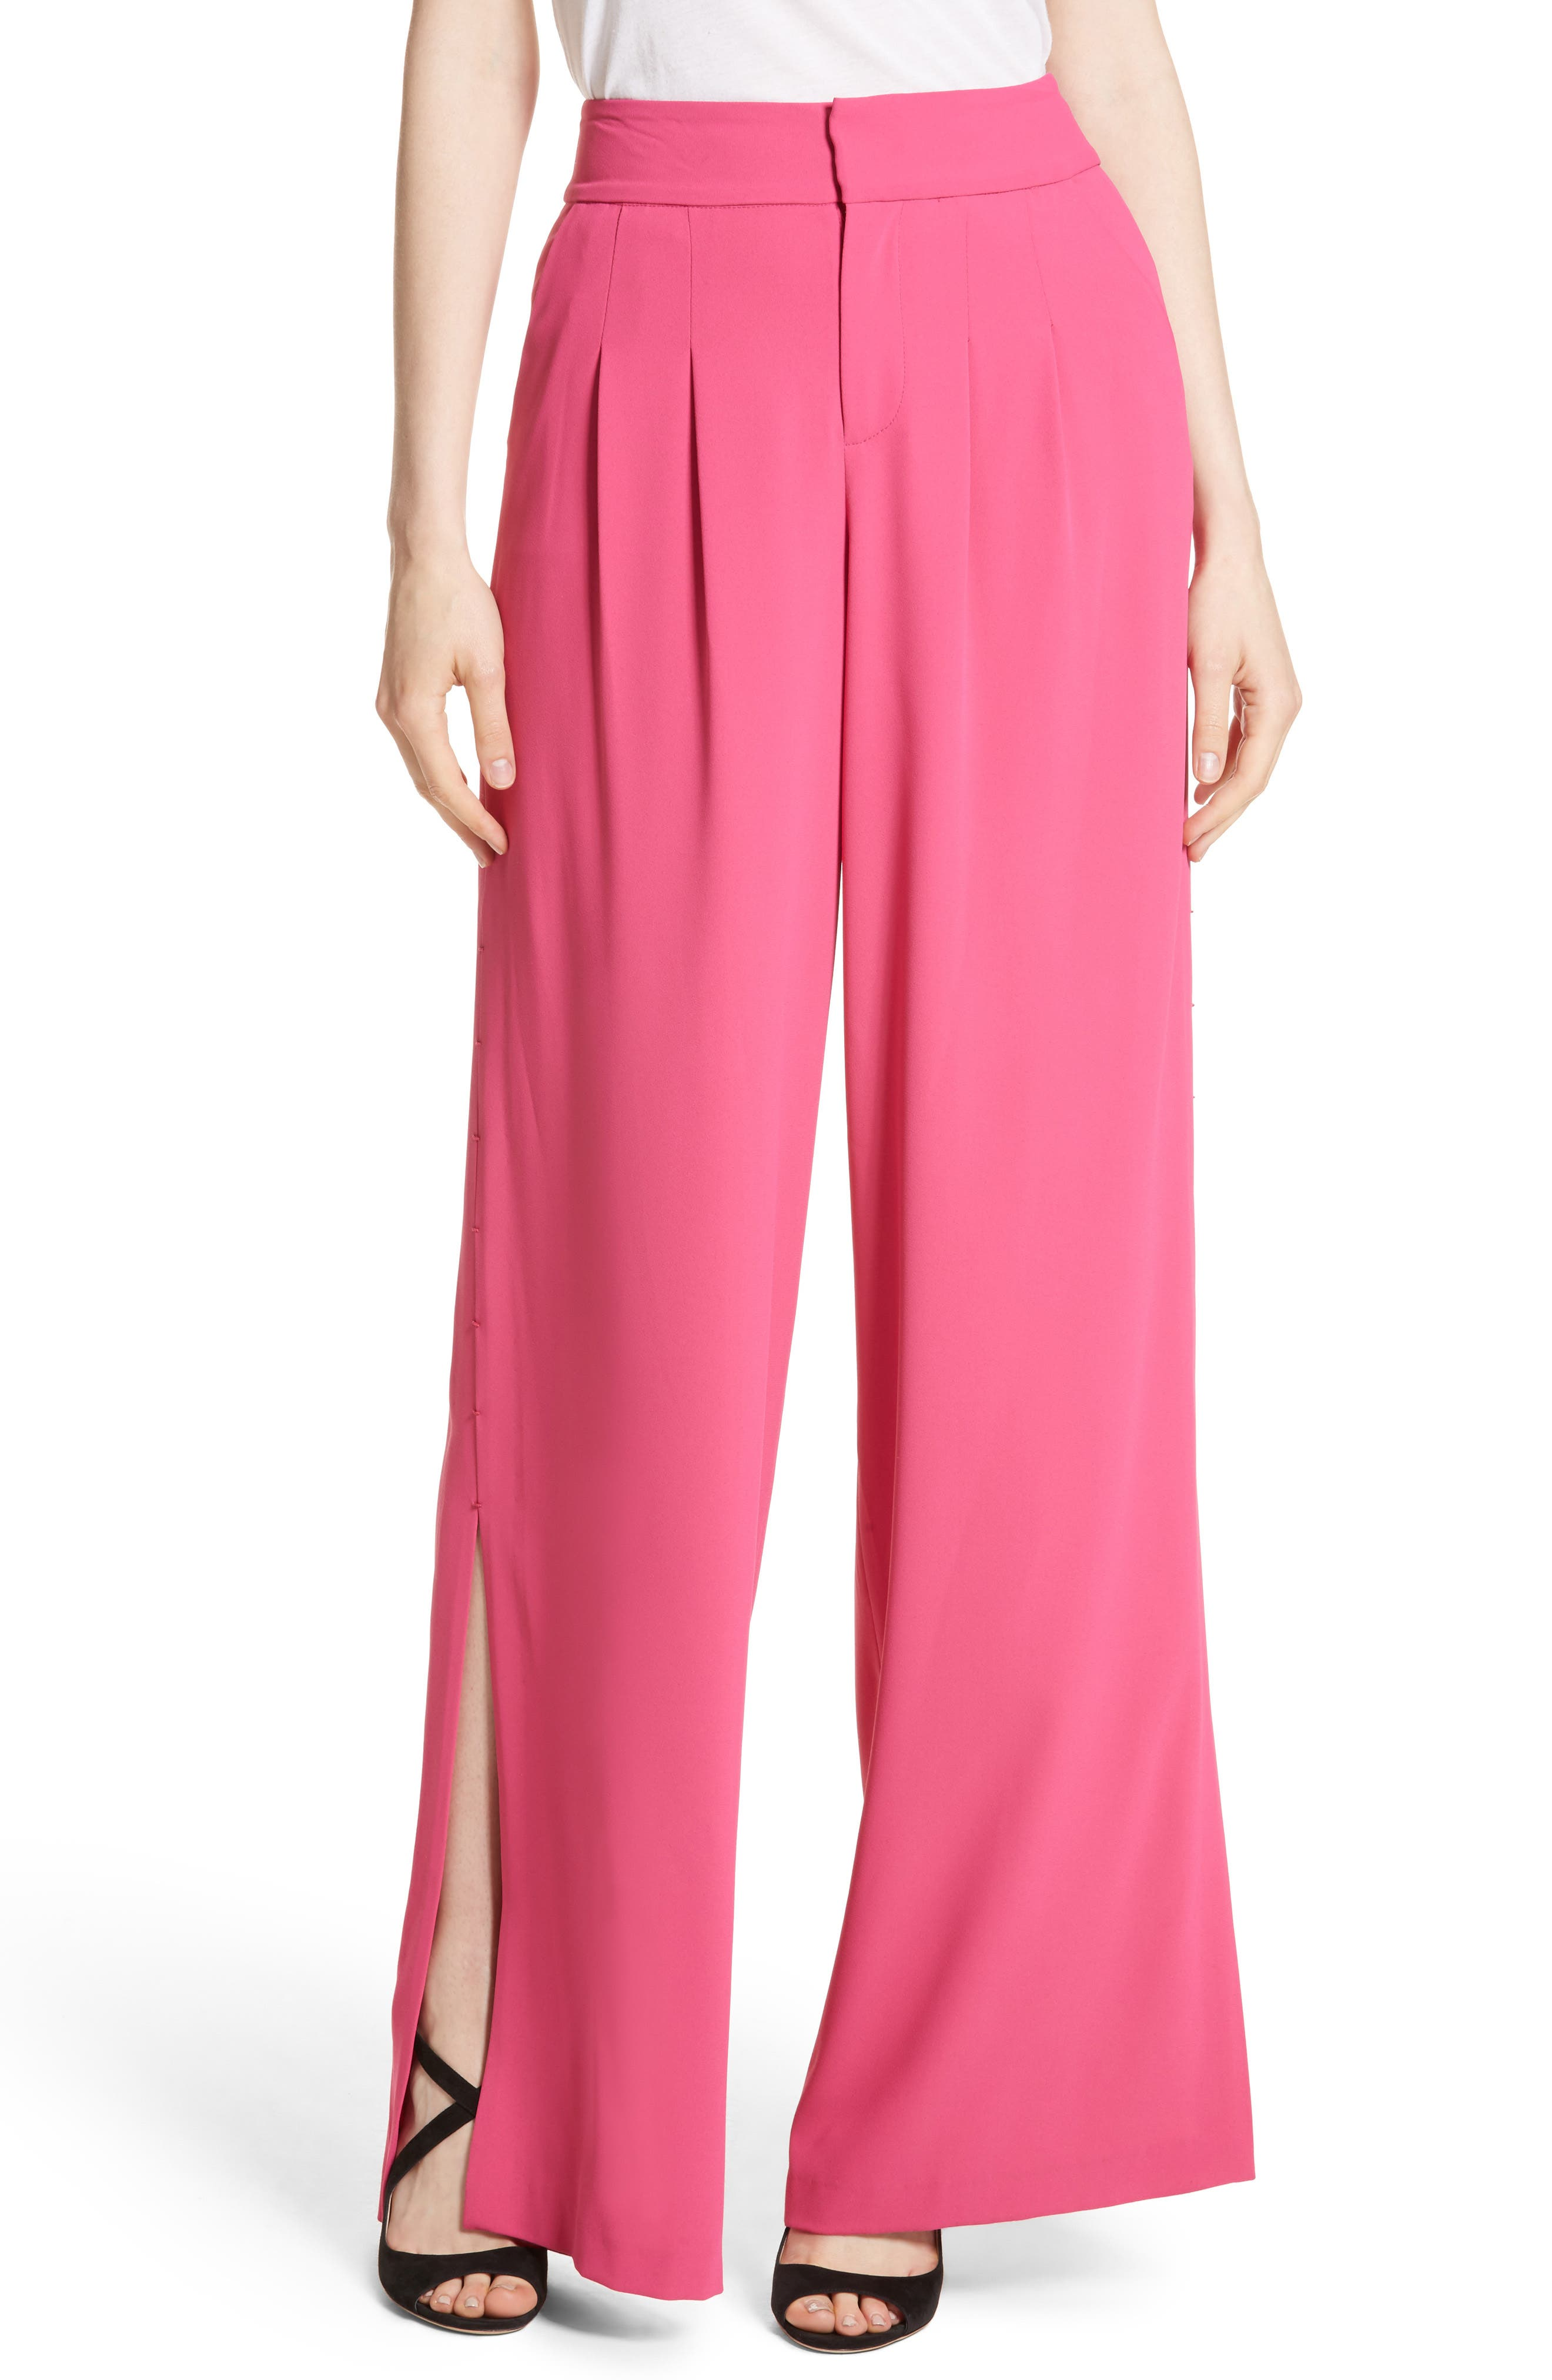 Shavon High Waist Side Slit Flare Pants,                         Main,                         color, Fuchsia